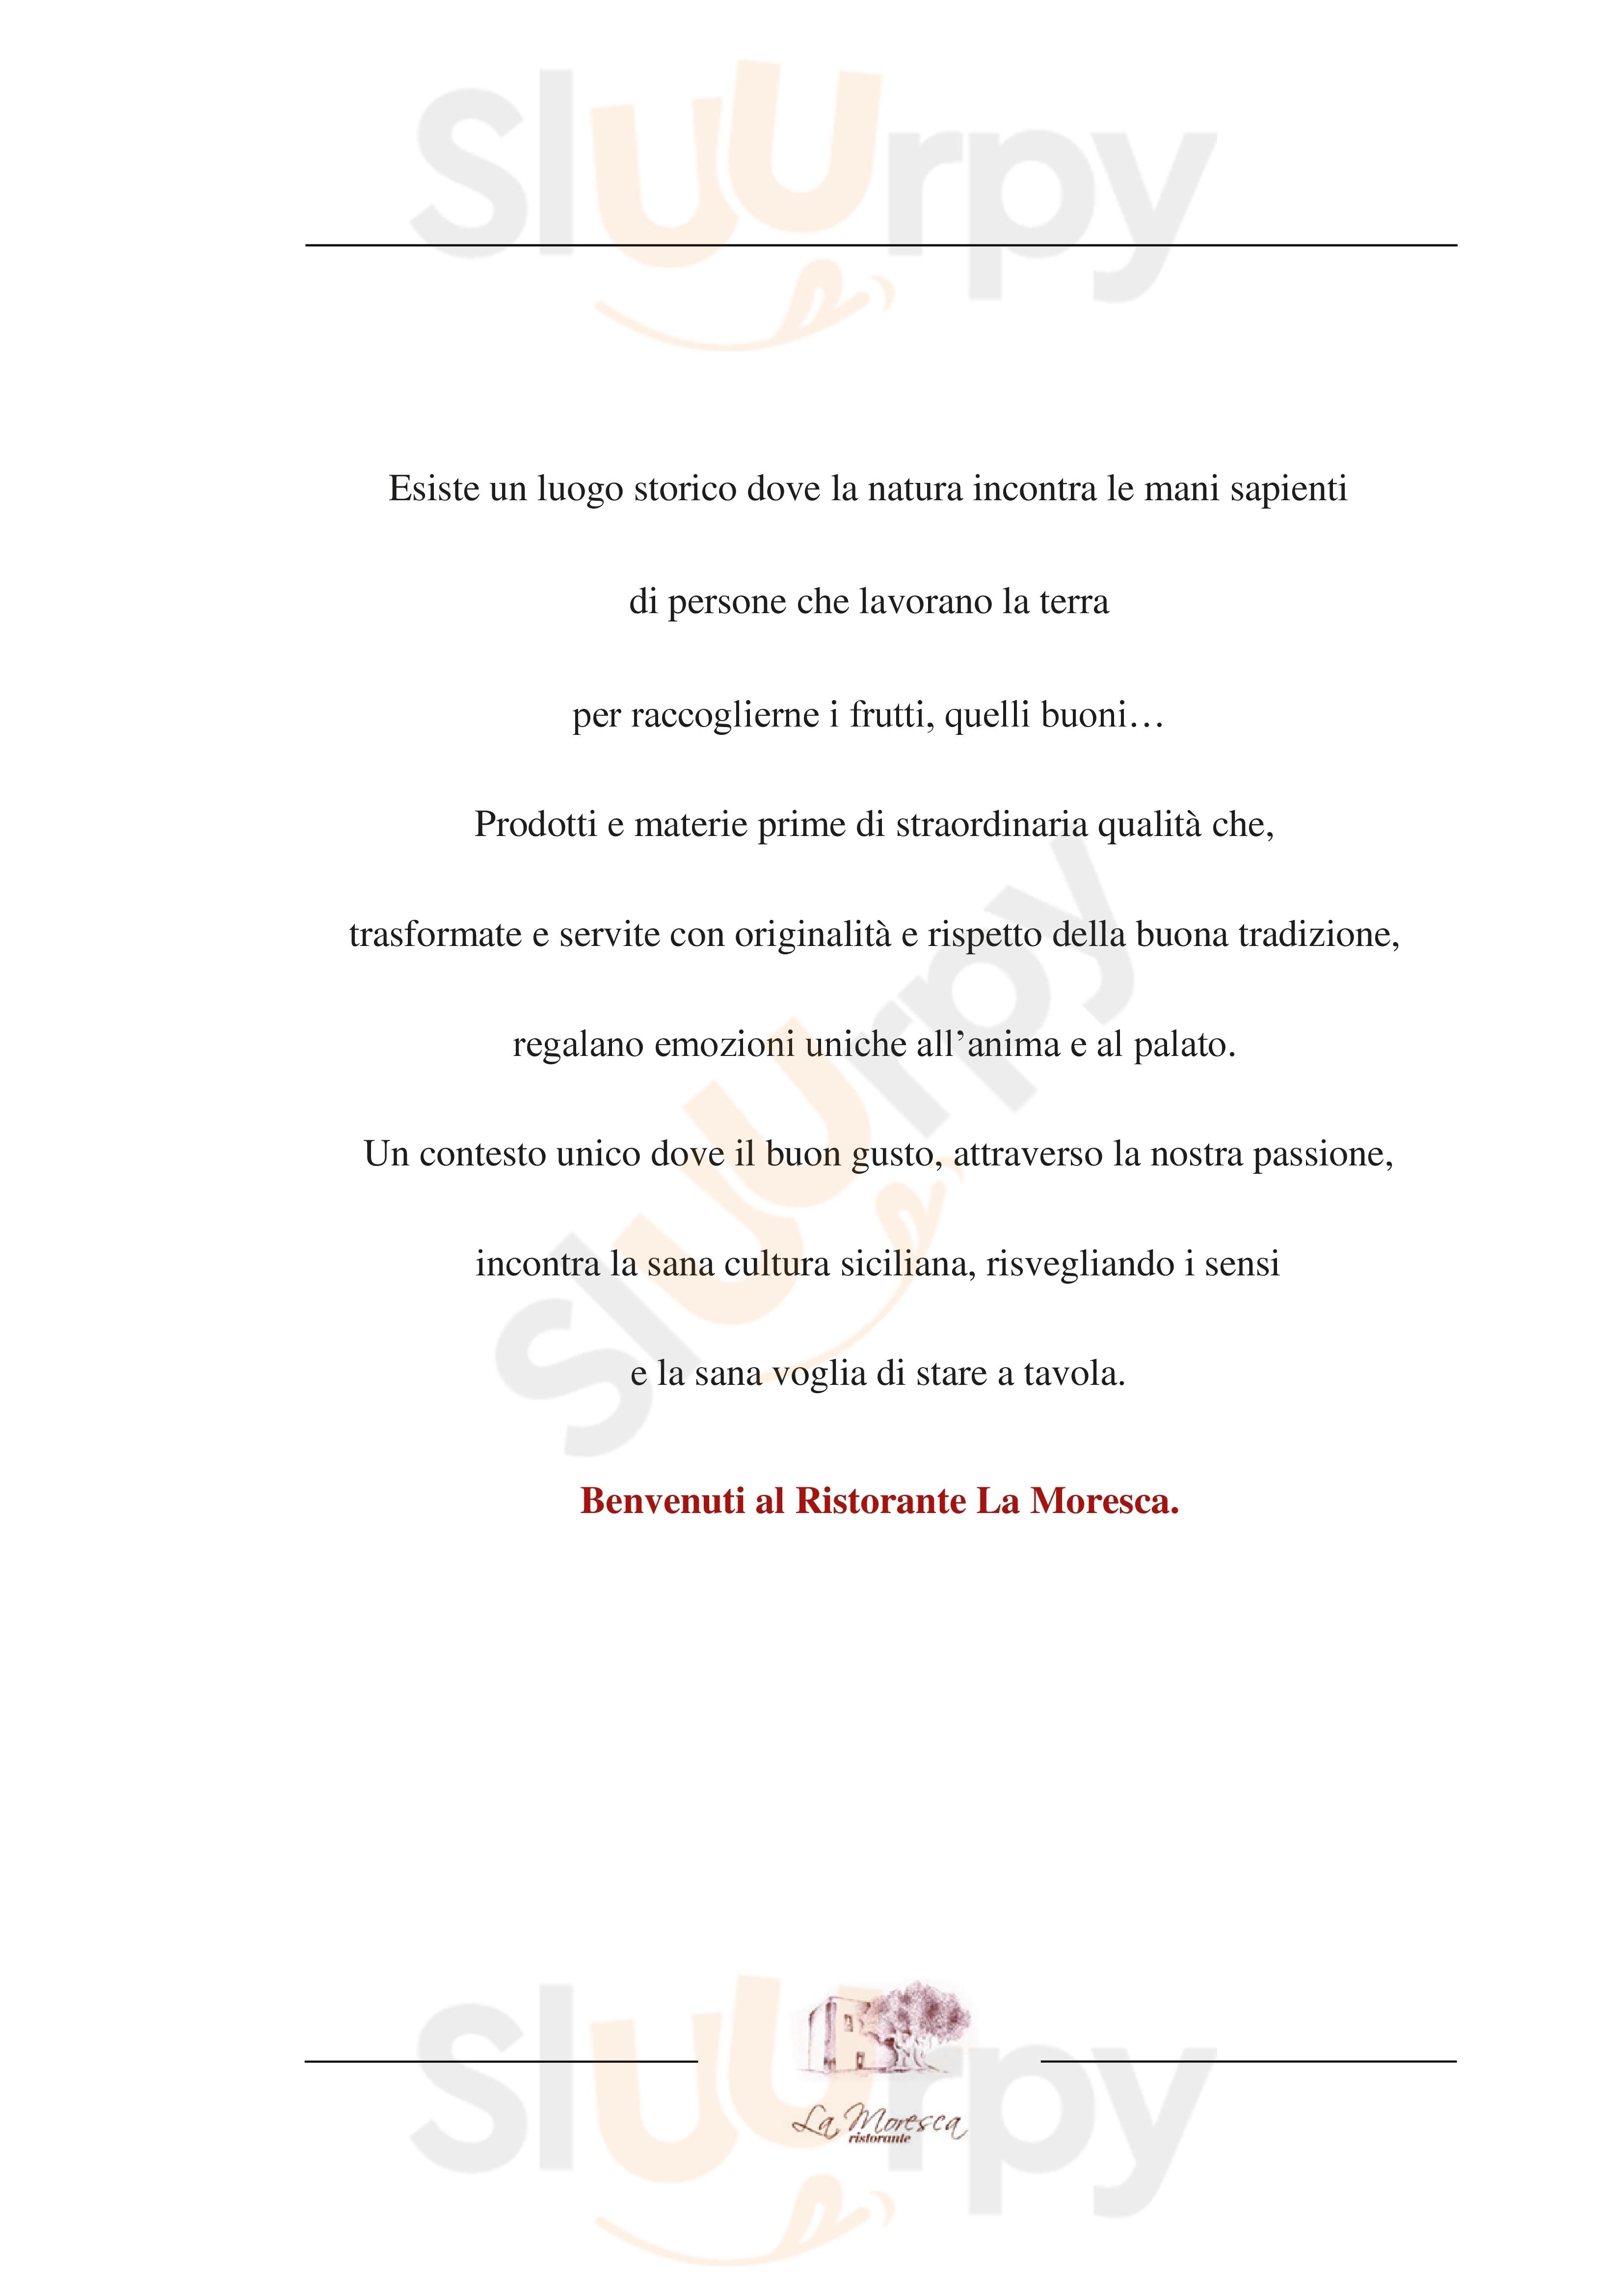 La Moresca Ispica menù 1 pagina